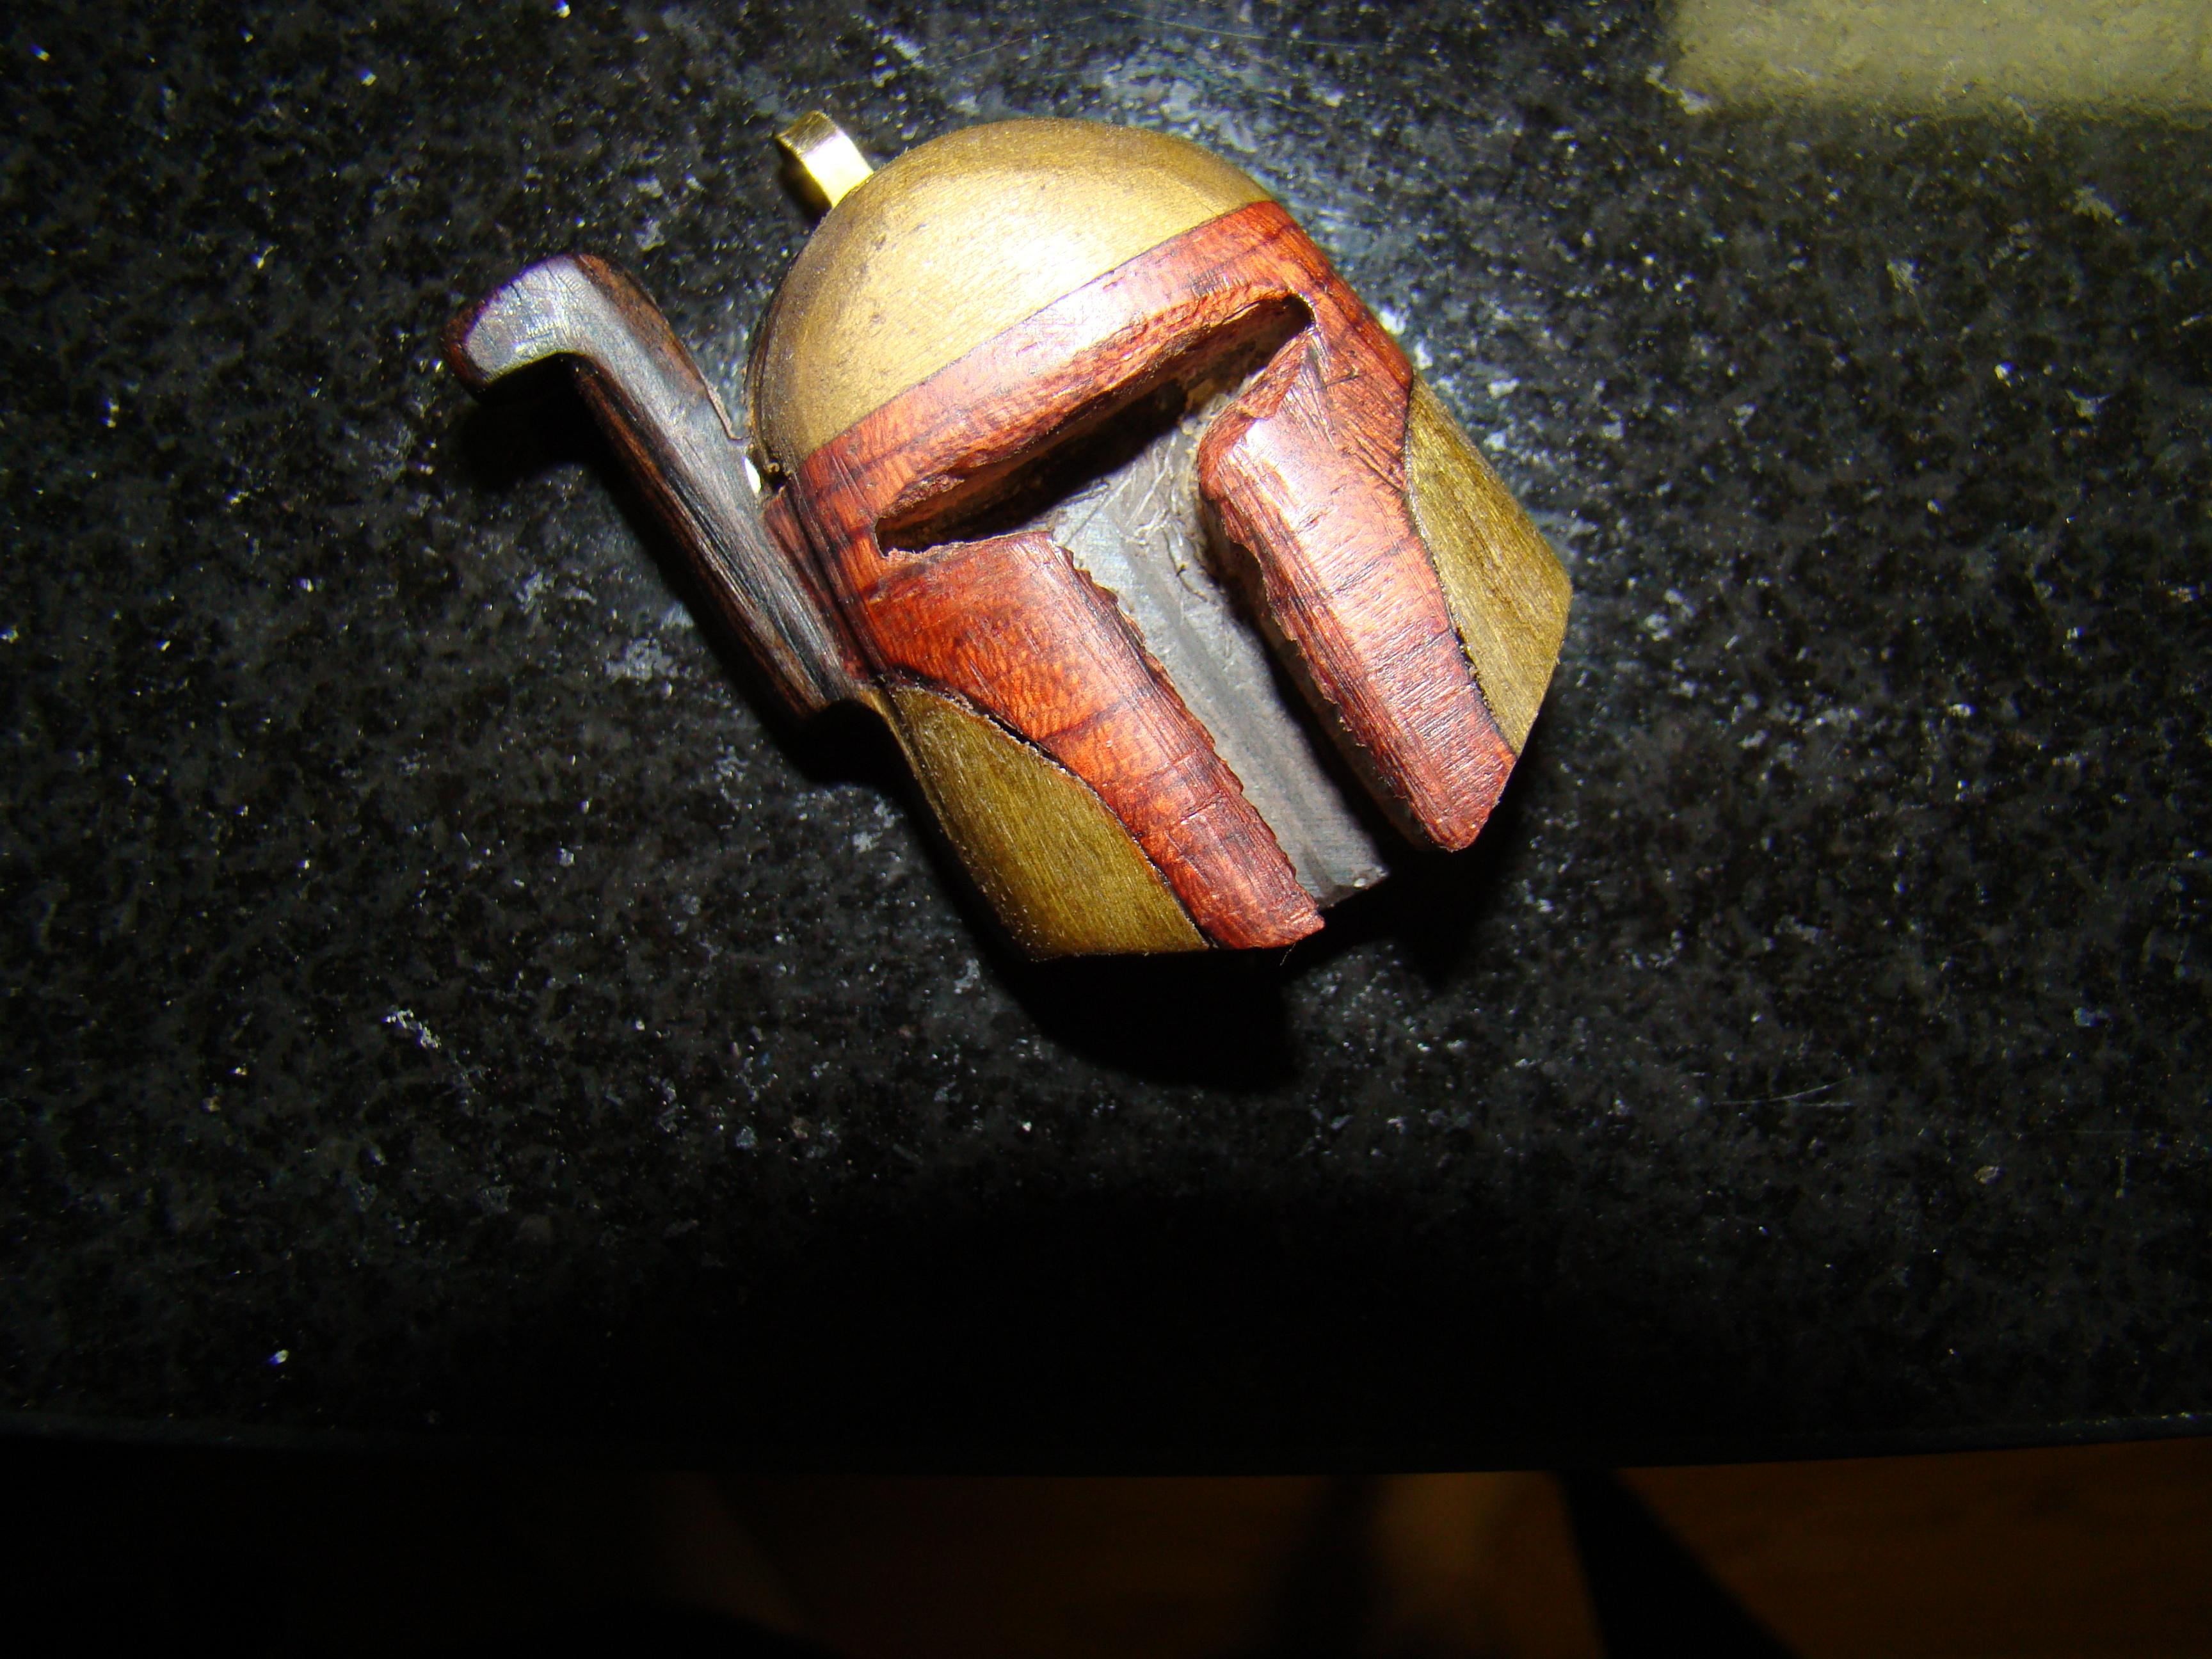 Wooden Boba Fett Necklace/ Keychain